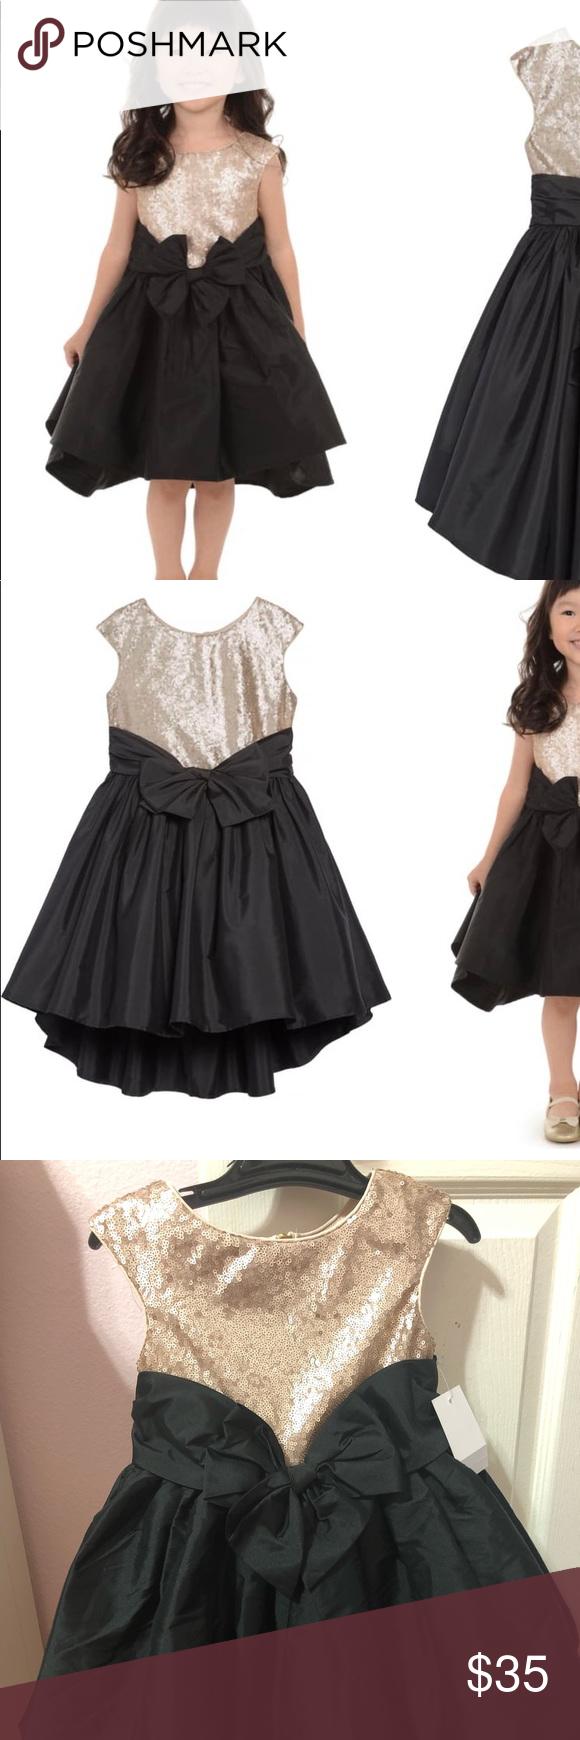 2t Gold Sequin And Black High Low Dress Black High Low Dress Dresses Clothes Design [ 1740 x 580 Pixel ]